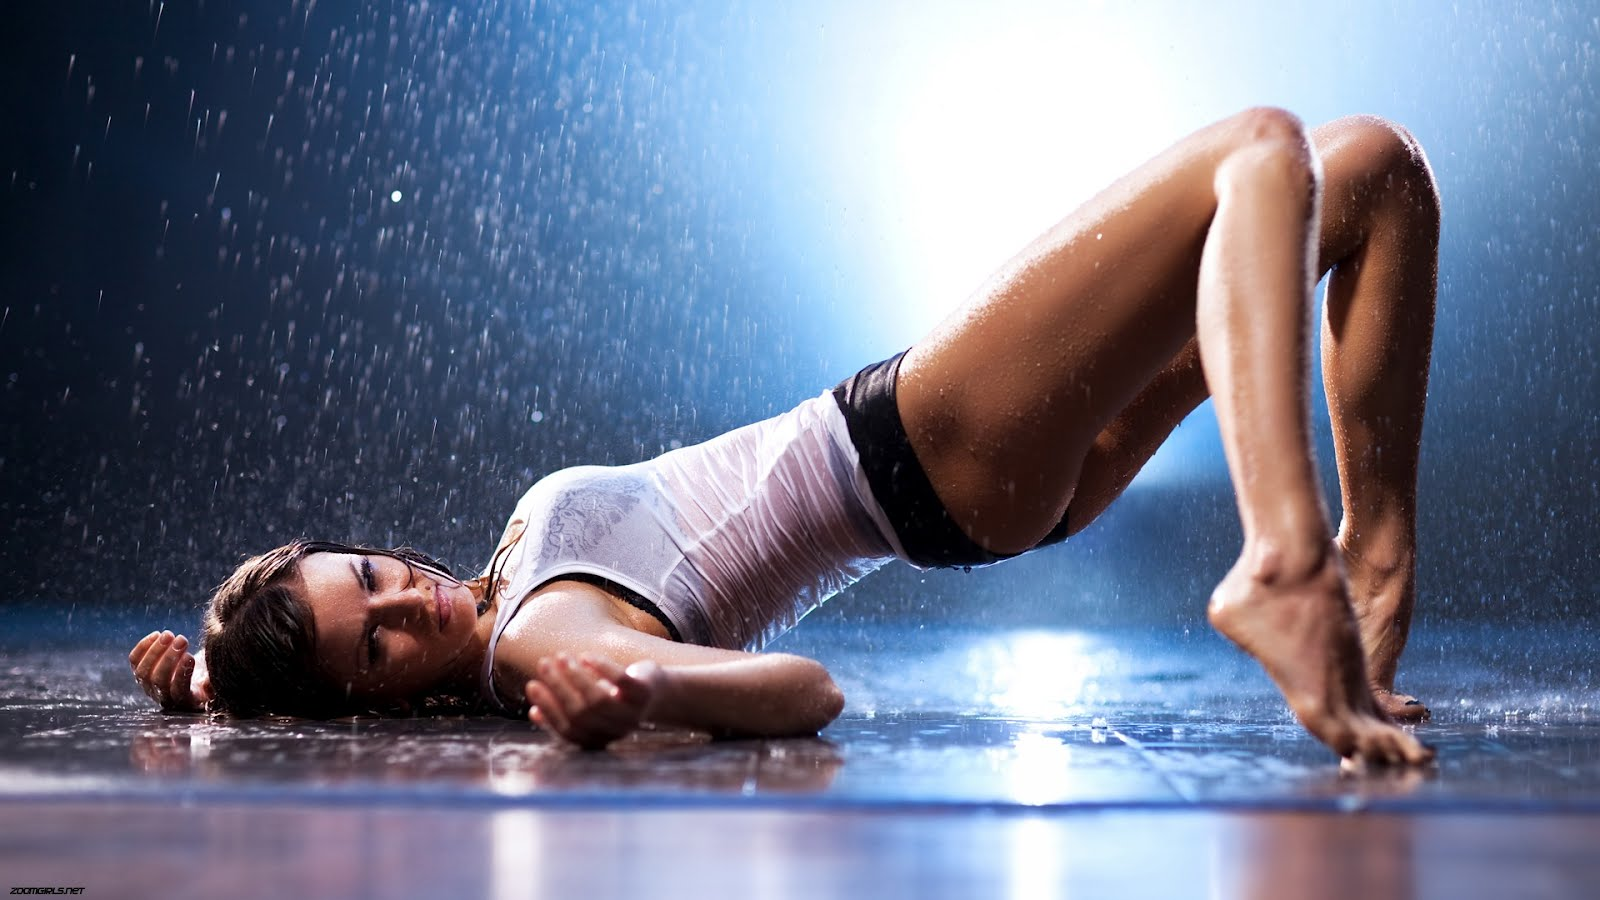 Wet Legs 110